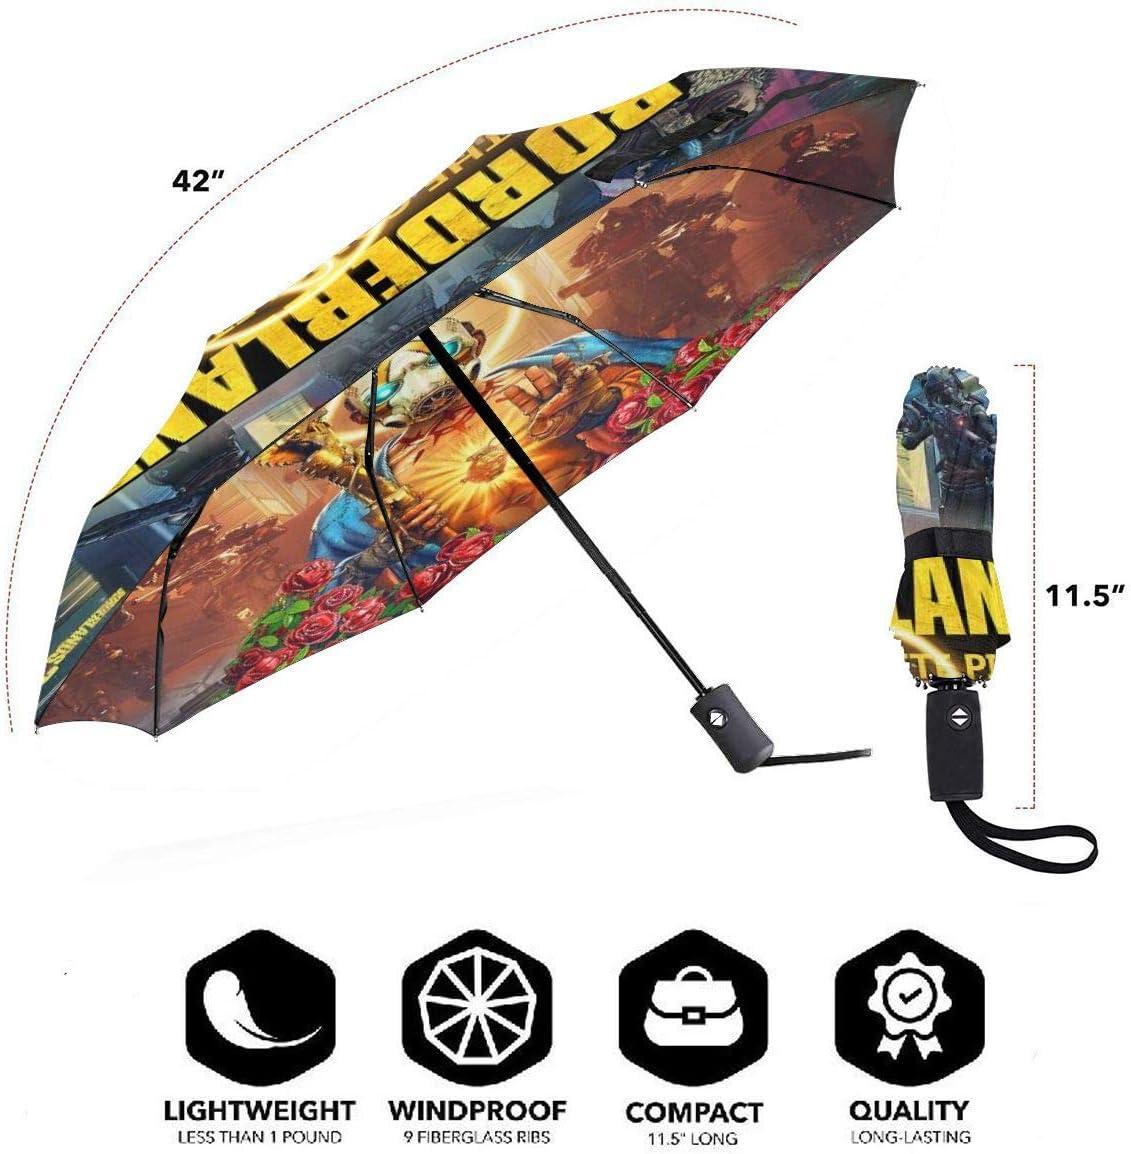 Borderlands Poster 3D Pattern PG Cloth Lightweight Foldable Tri-fold Umbrealla For Rain Sunshade Anti-UV,Qucik-dry Wind Resistance Automatic Umbrellas